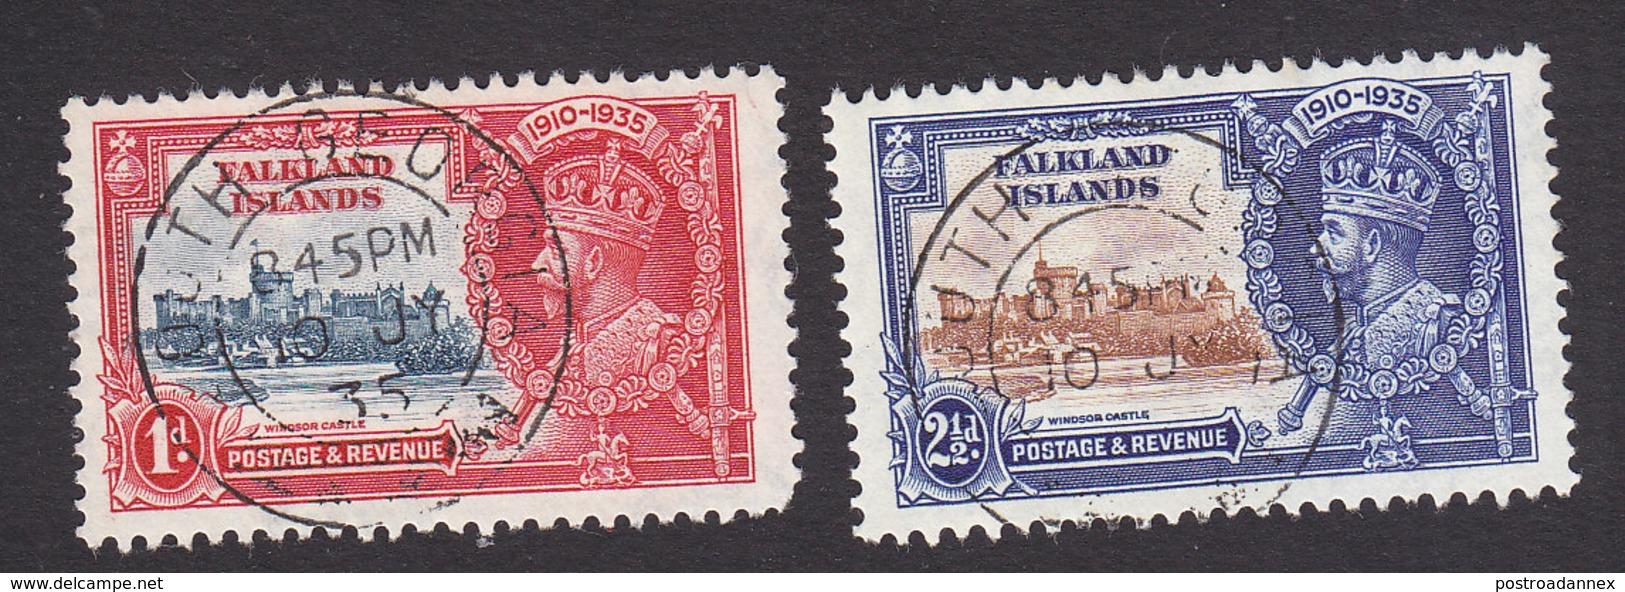 Falkland Islands, Scott #77-78, Used, Silver Jubilee, Issued 1935 - Falkland Islands